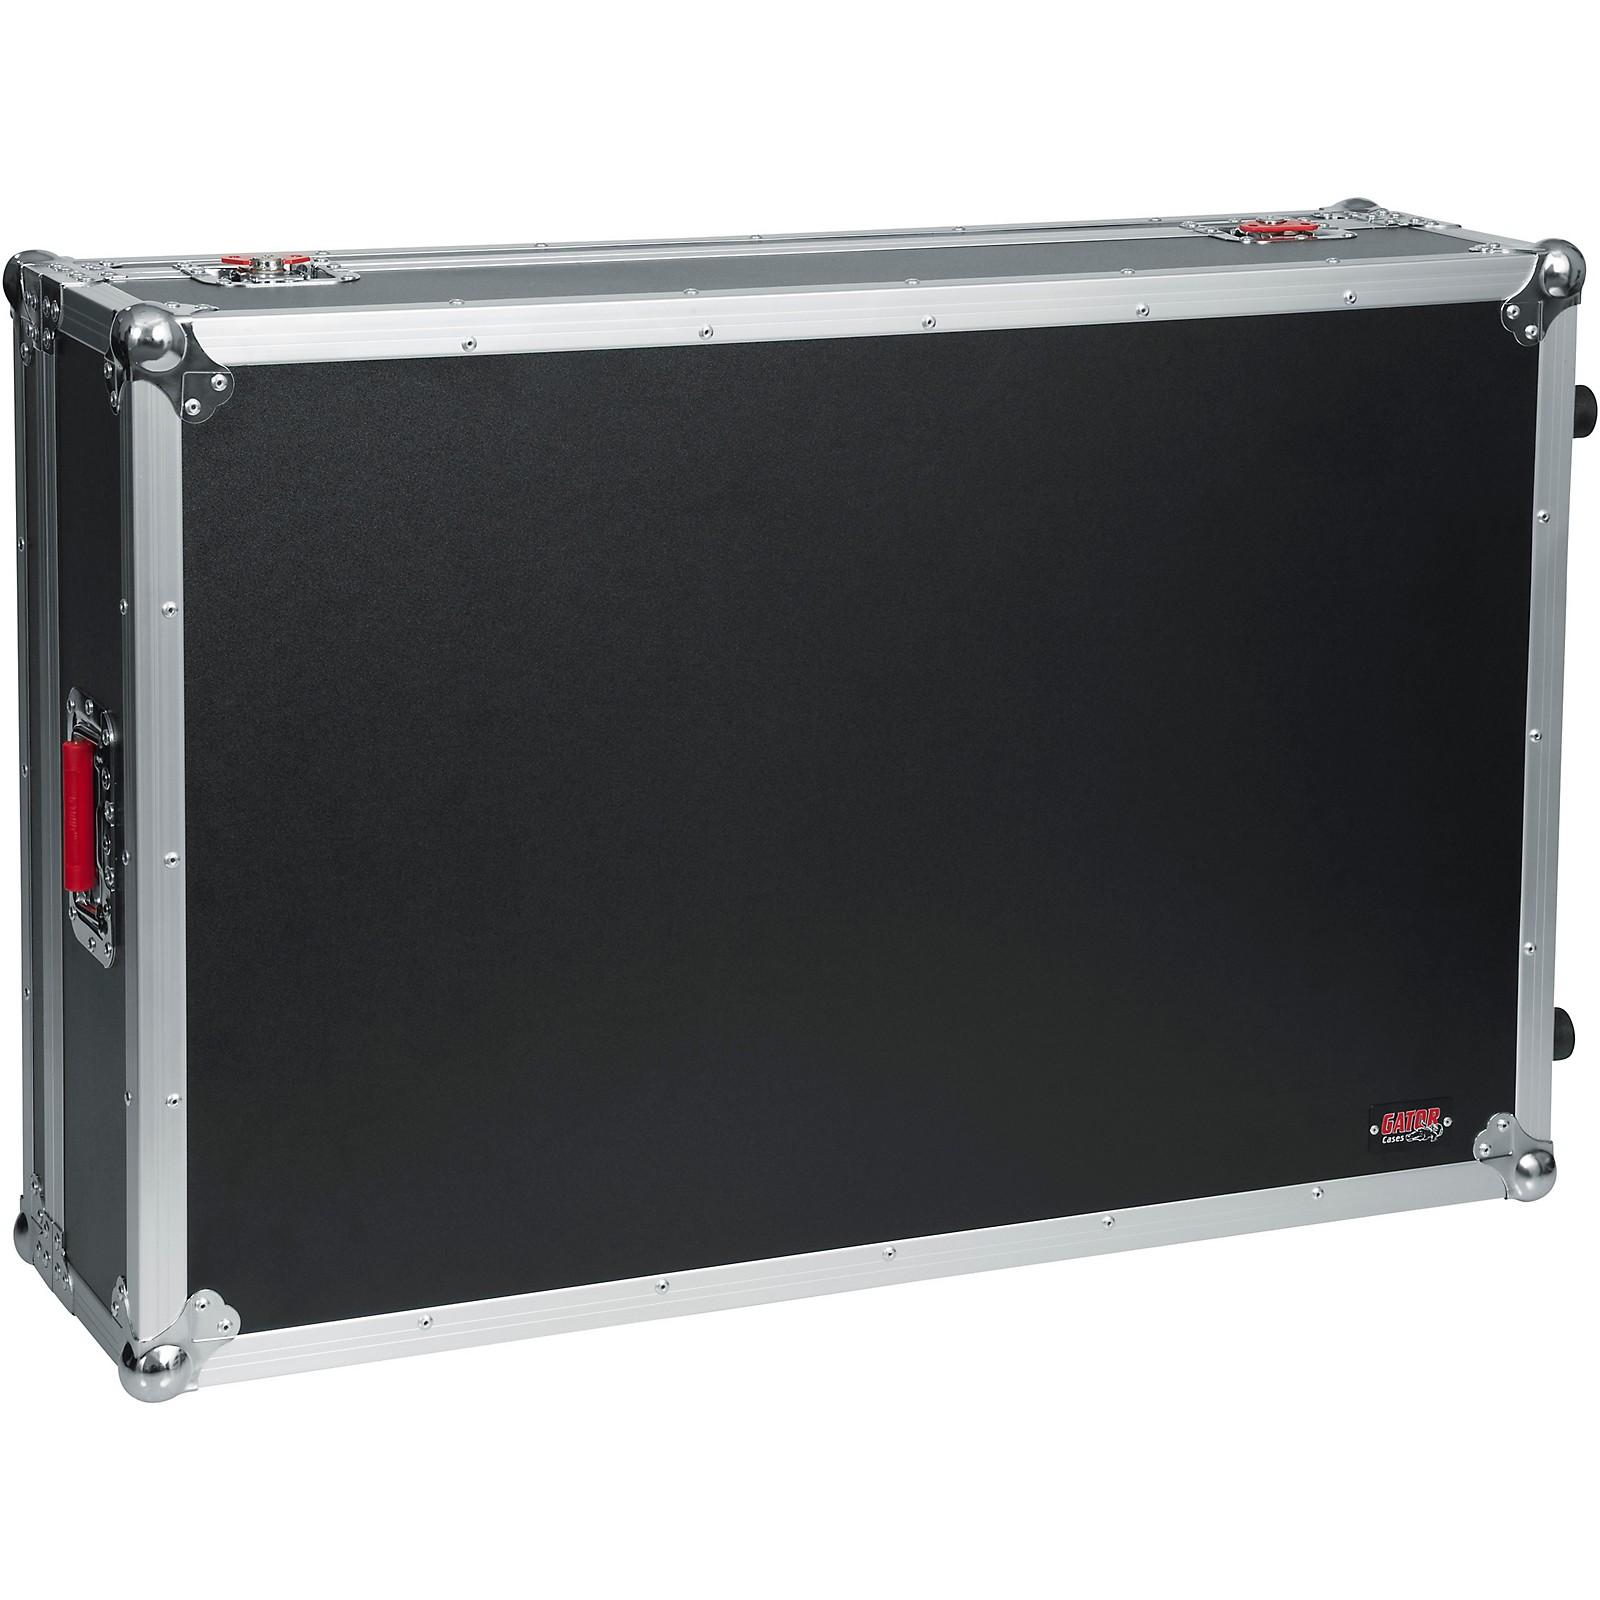 Open Box Gator G-TOURX32NDH ATA Road Case for Behringer X32 Mixer